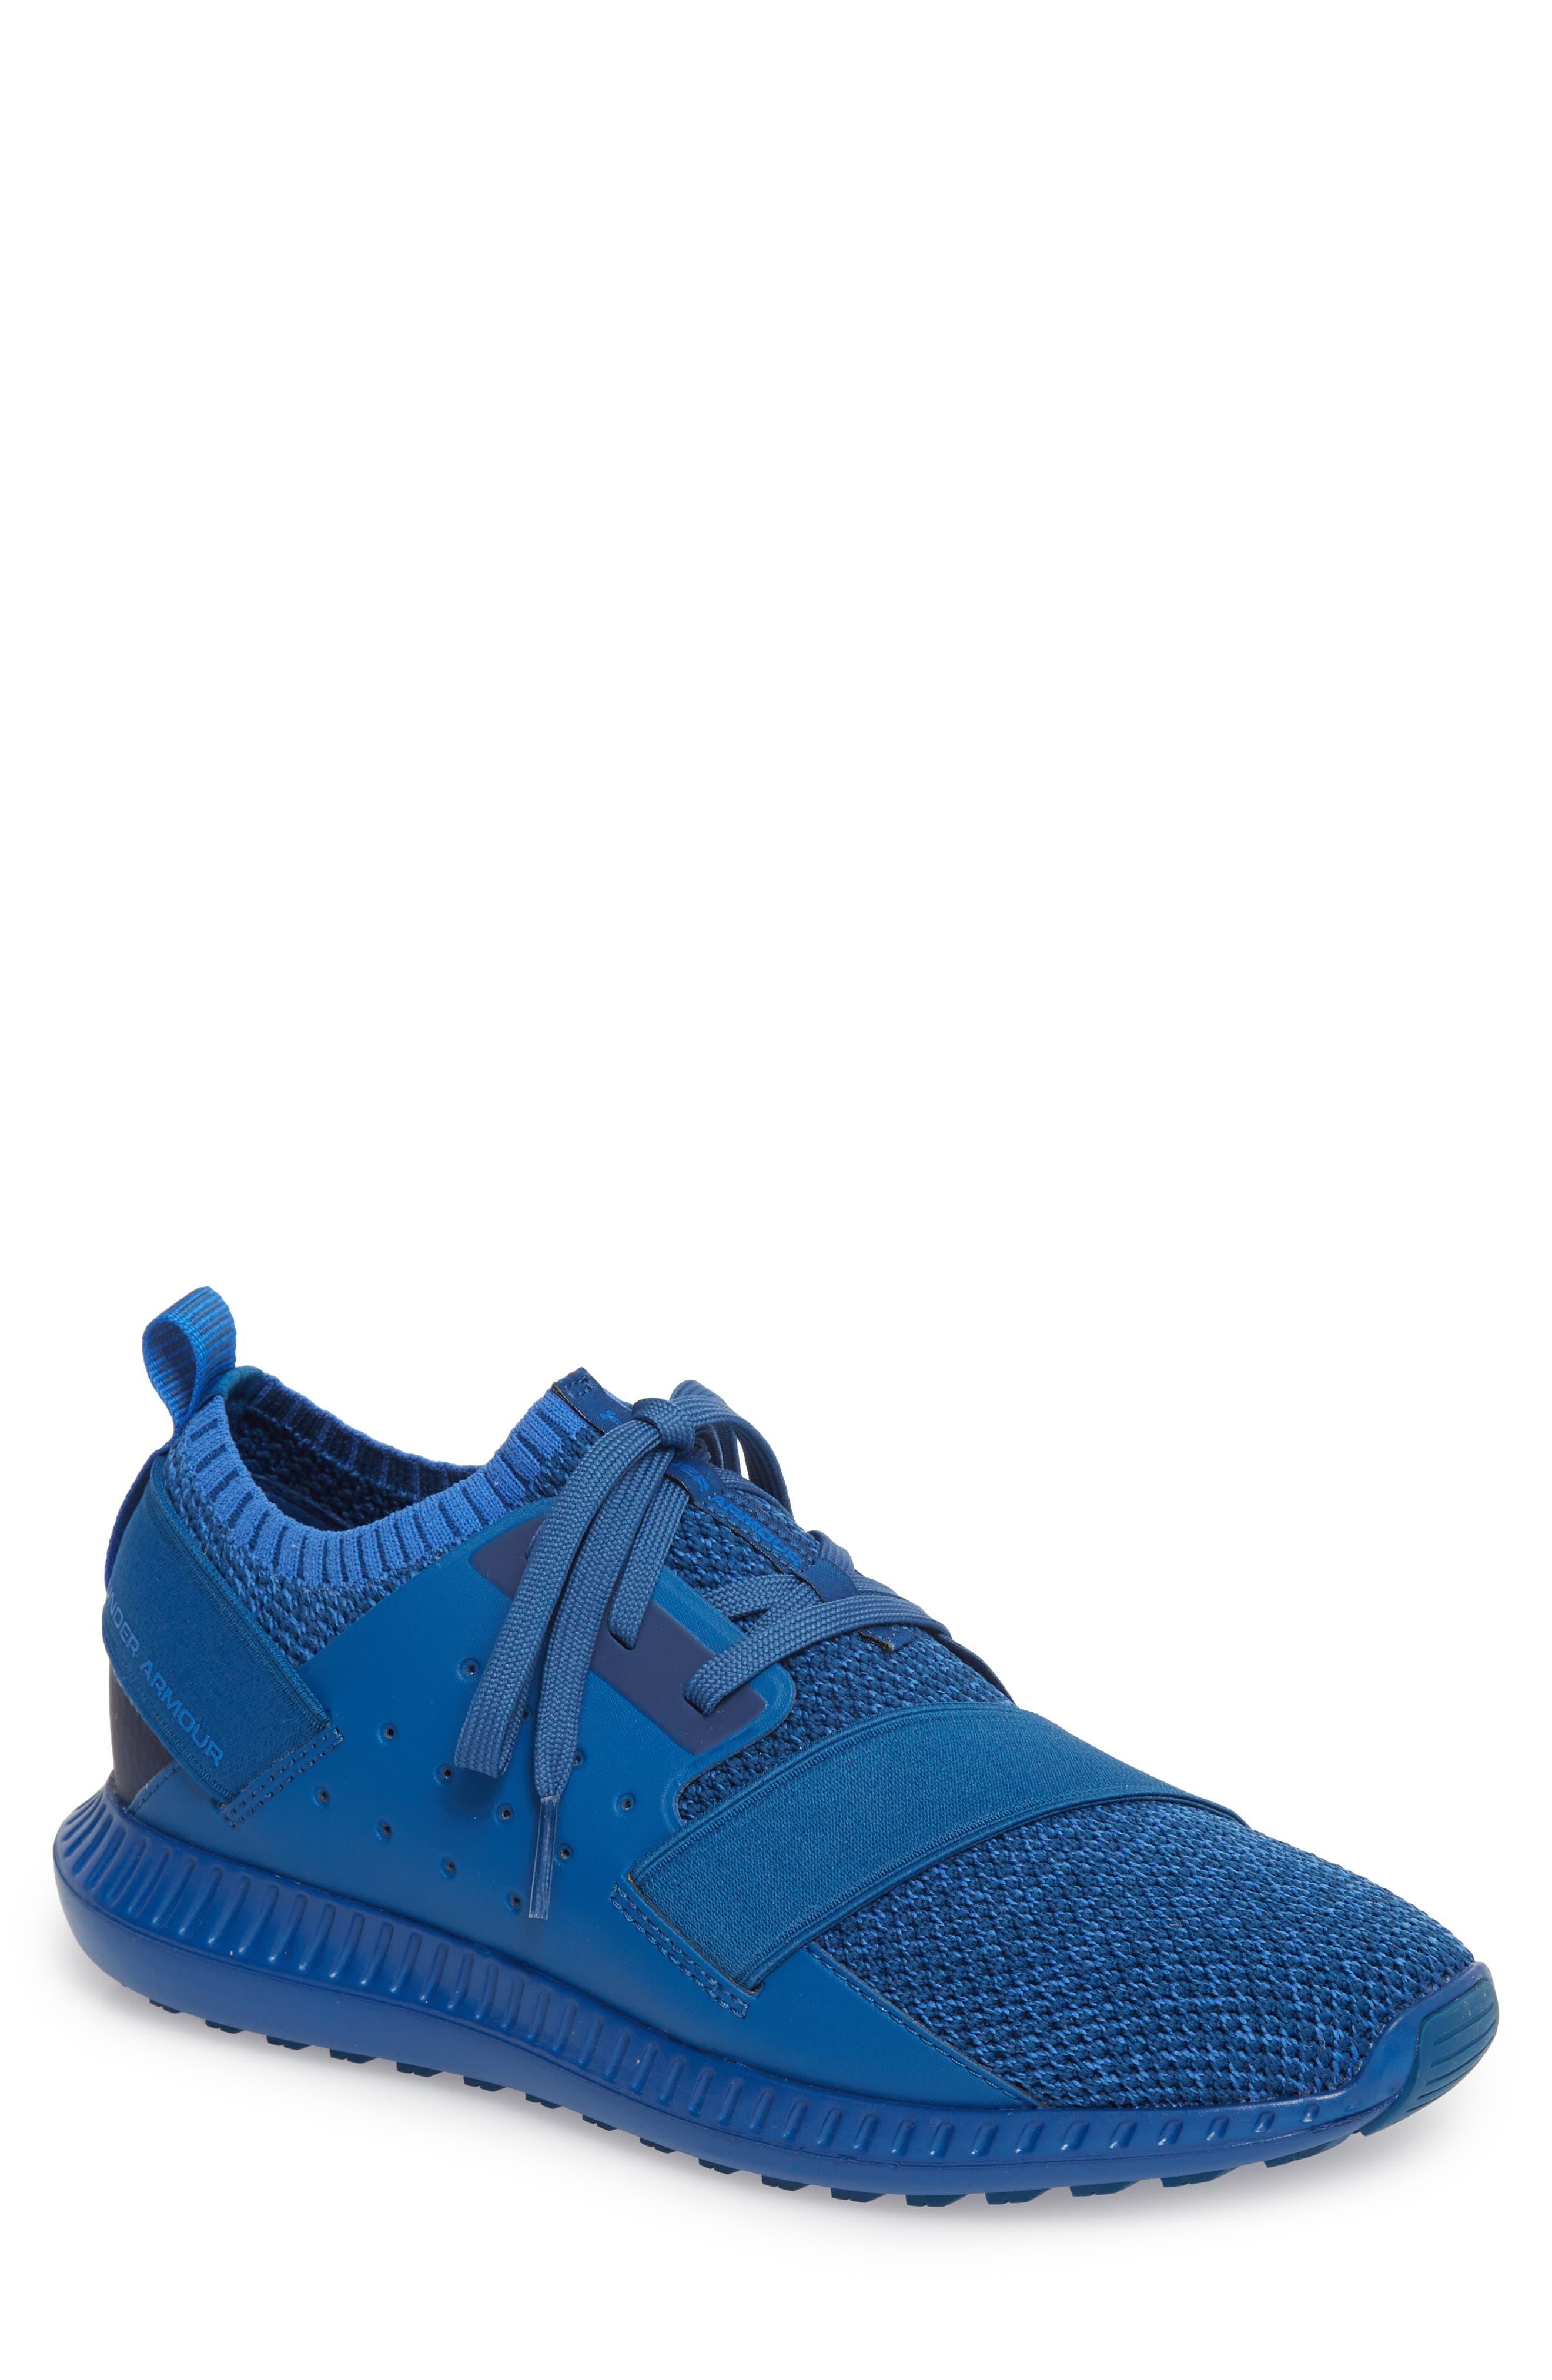 Threadborne Shift Sneaker,                         Main,                         color, BLUE / MEDITERRANEAN